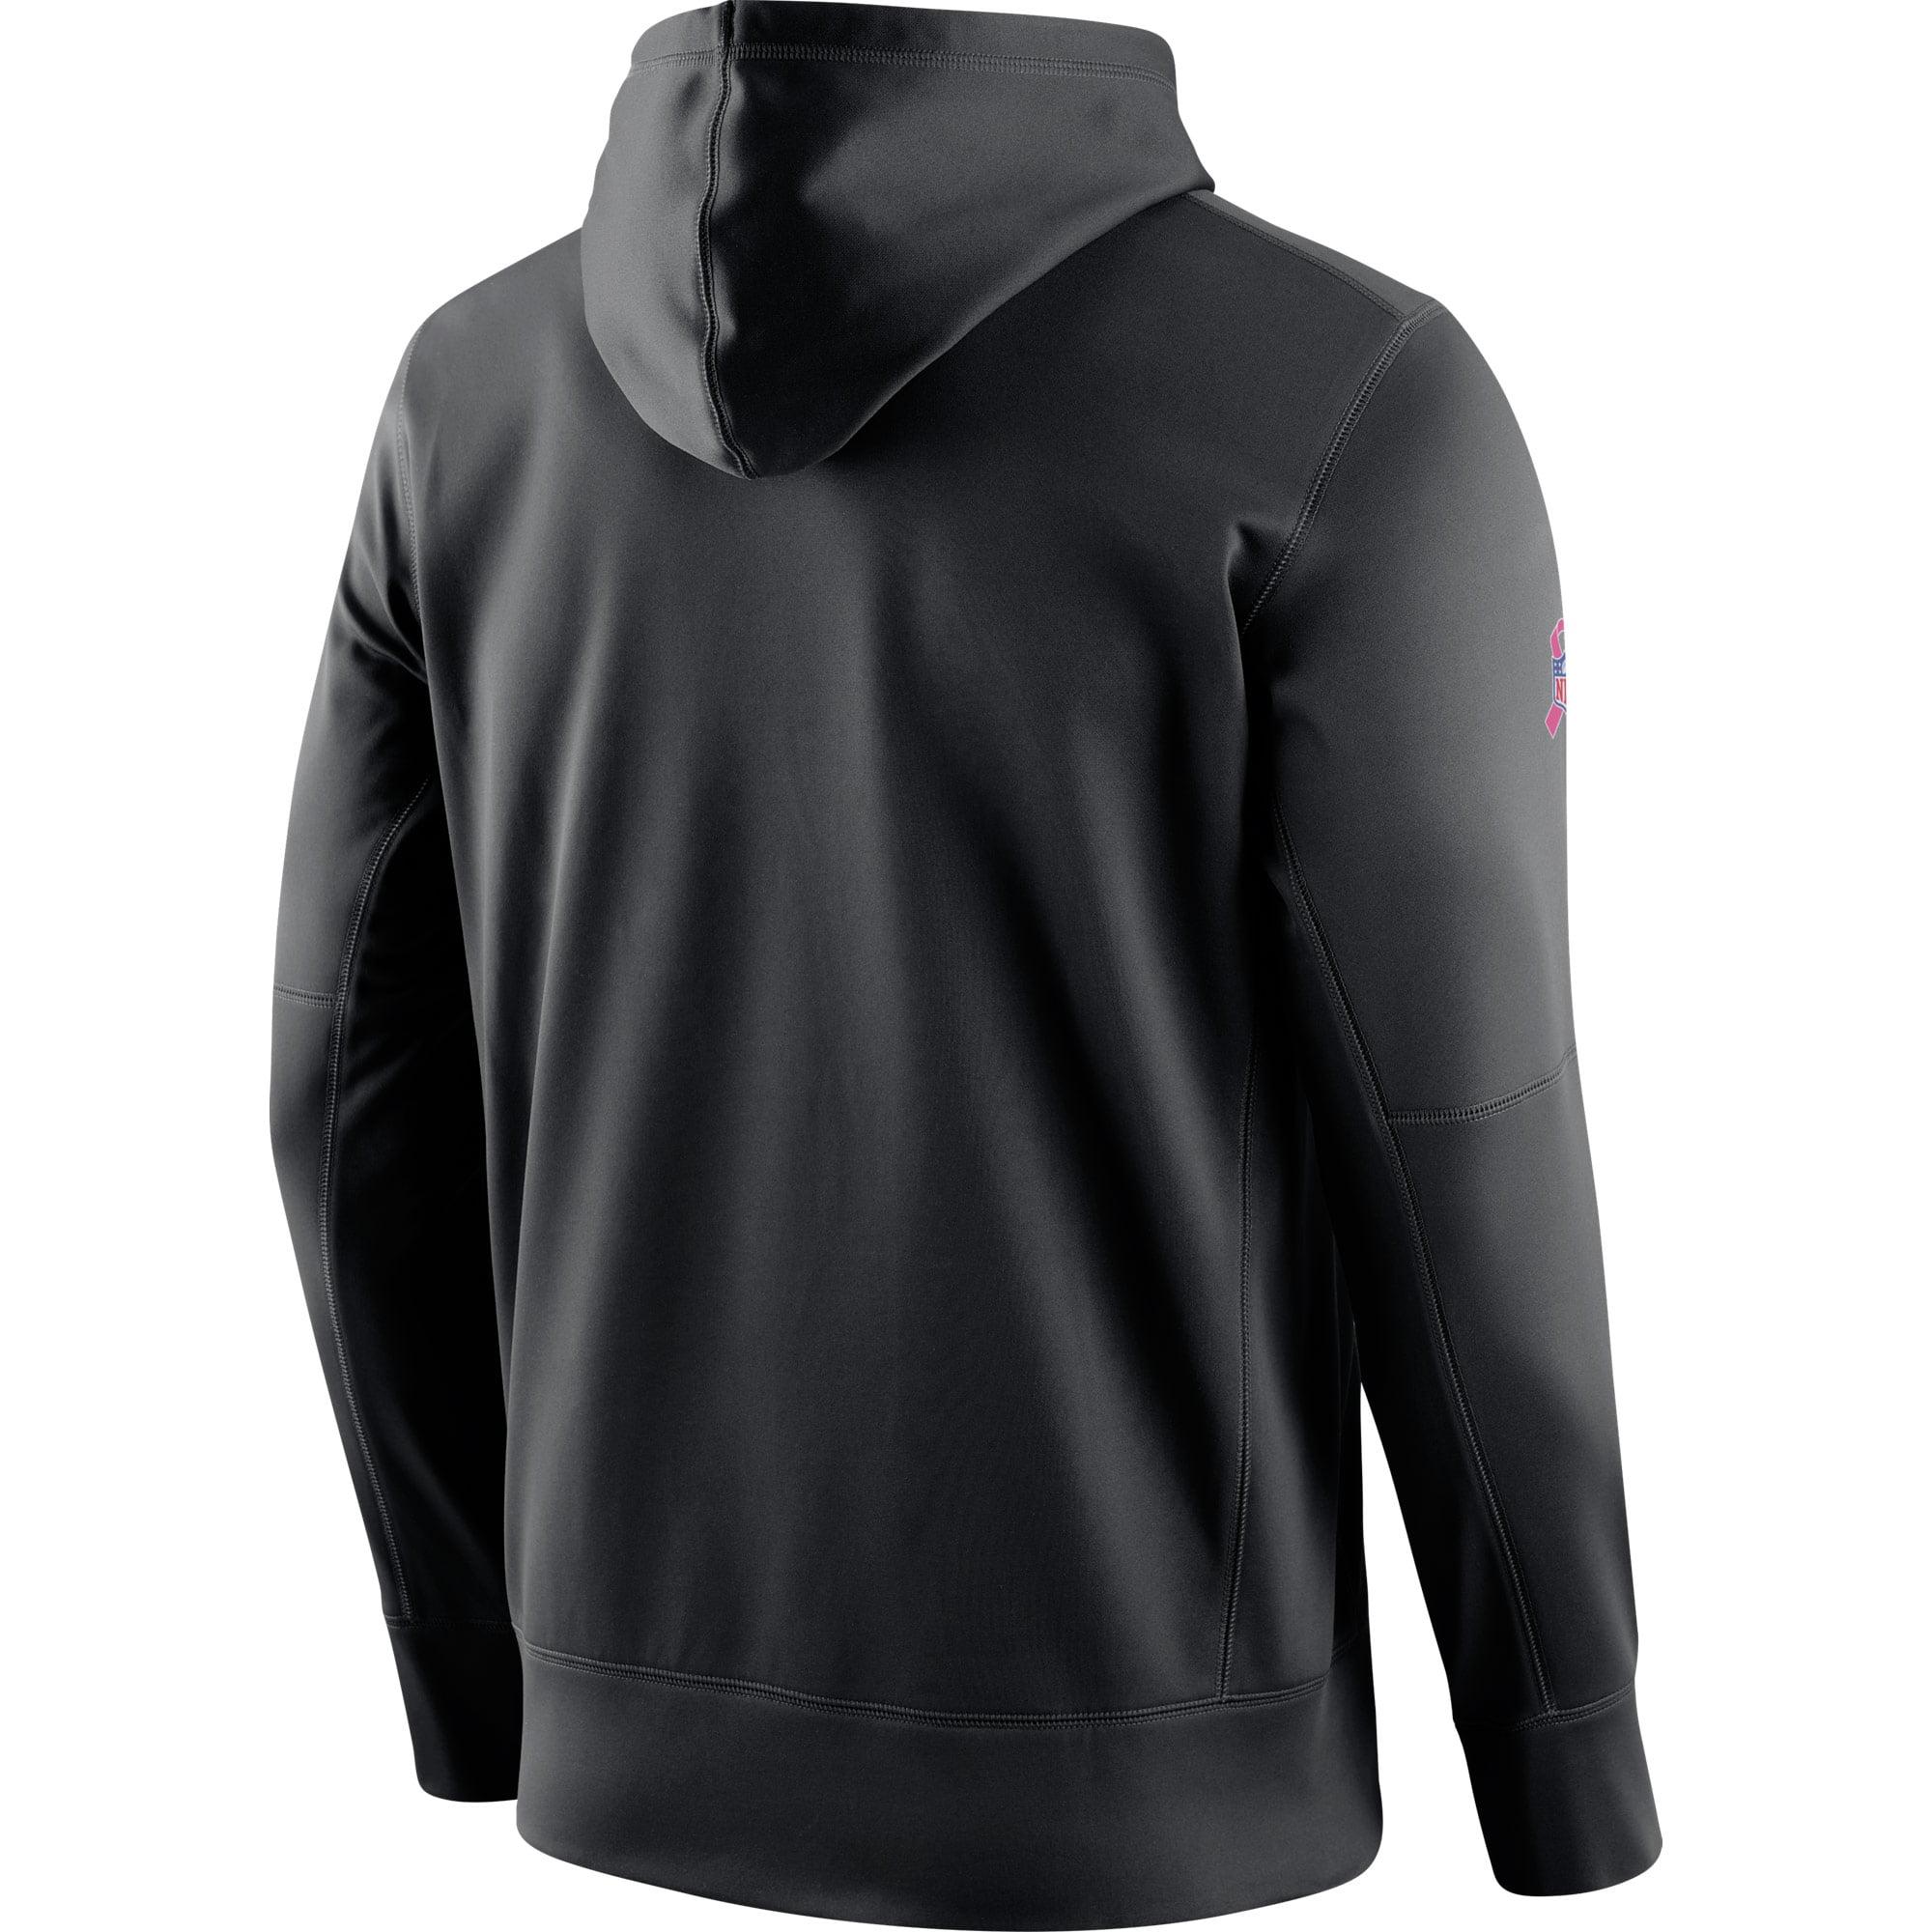 d595d3a0f45 Cincinnati Bengals Nike Breast Cancer Awareness Circuit Performance  Pullover Hoodie - Black - Walmart.com